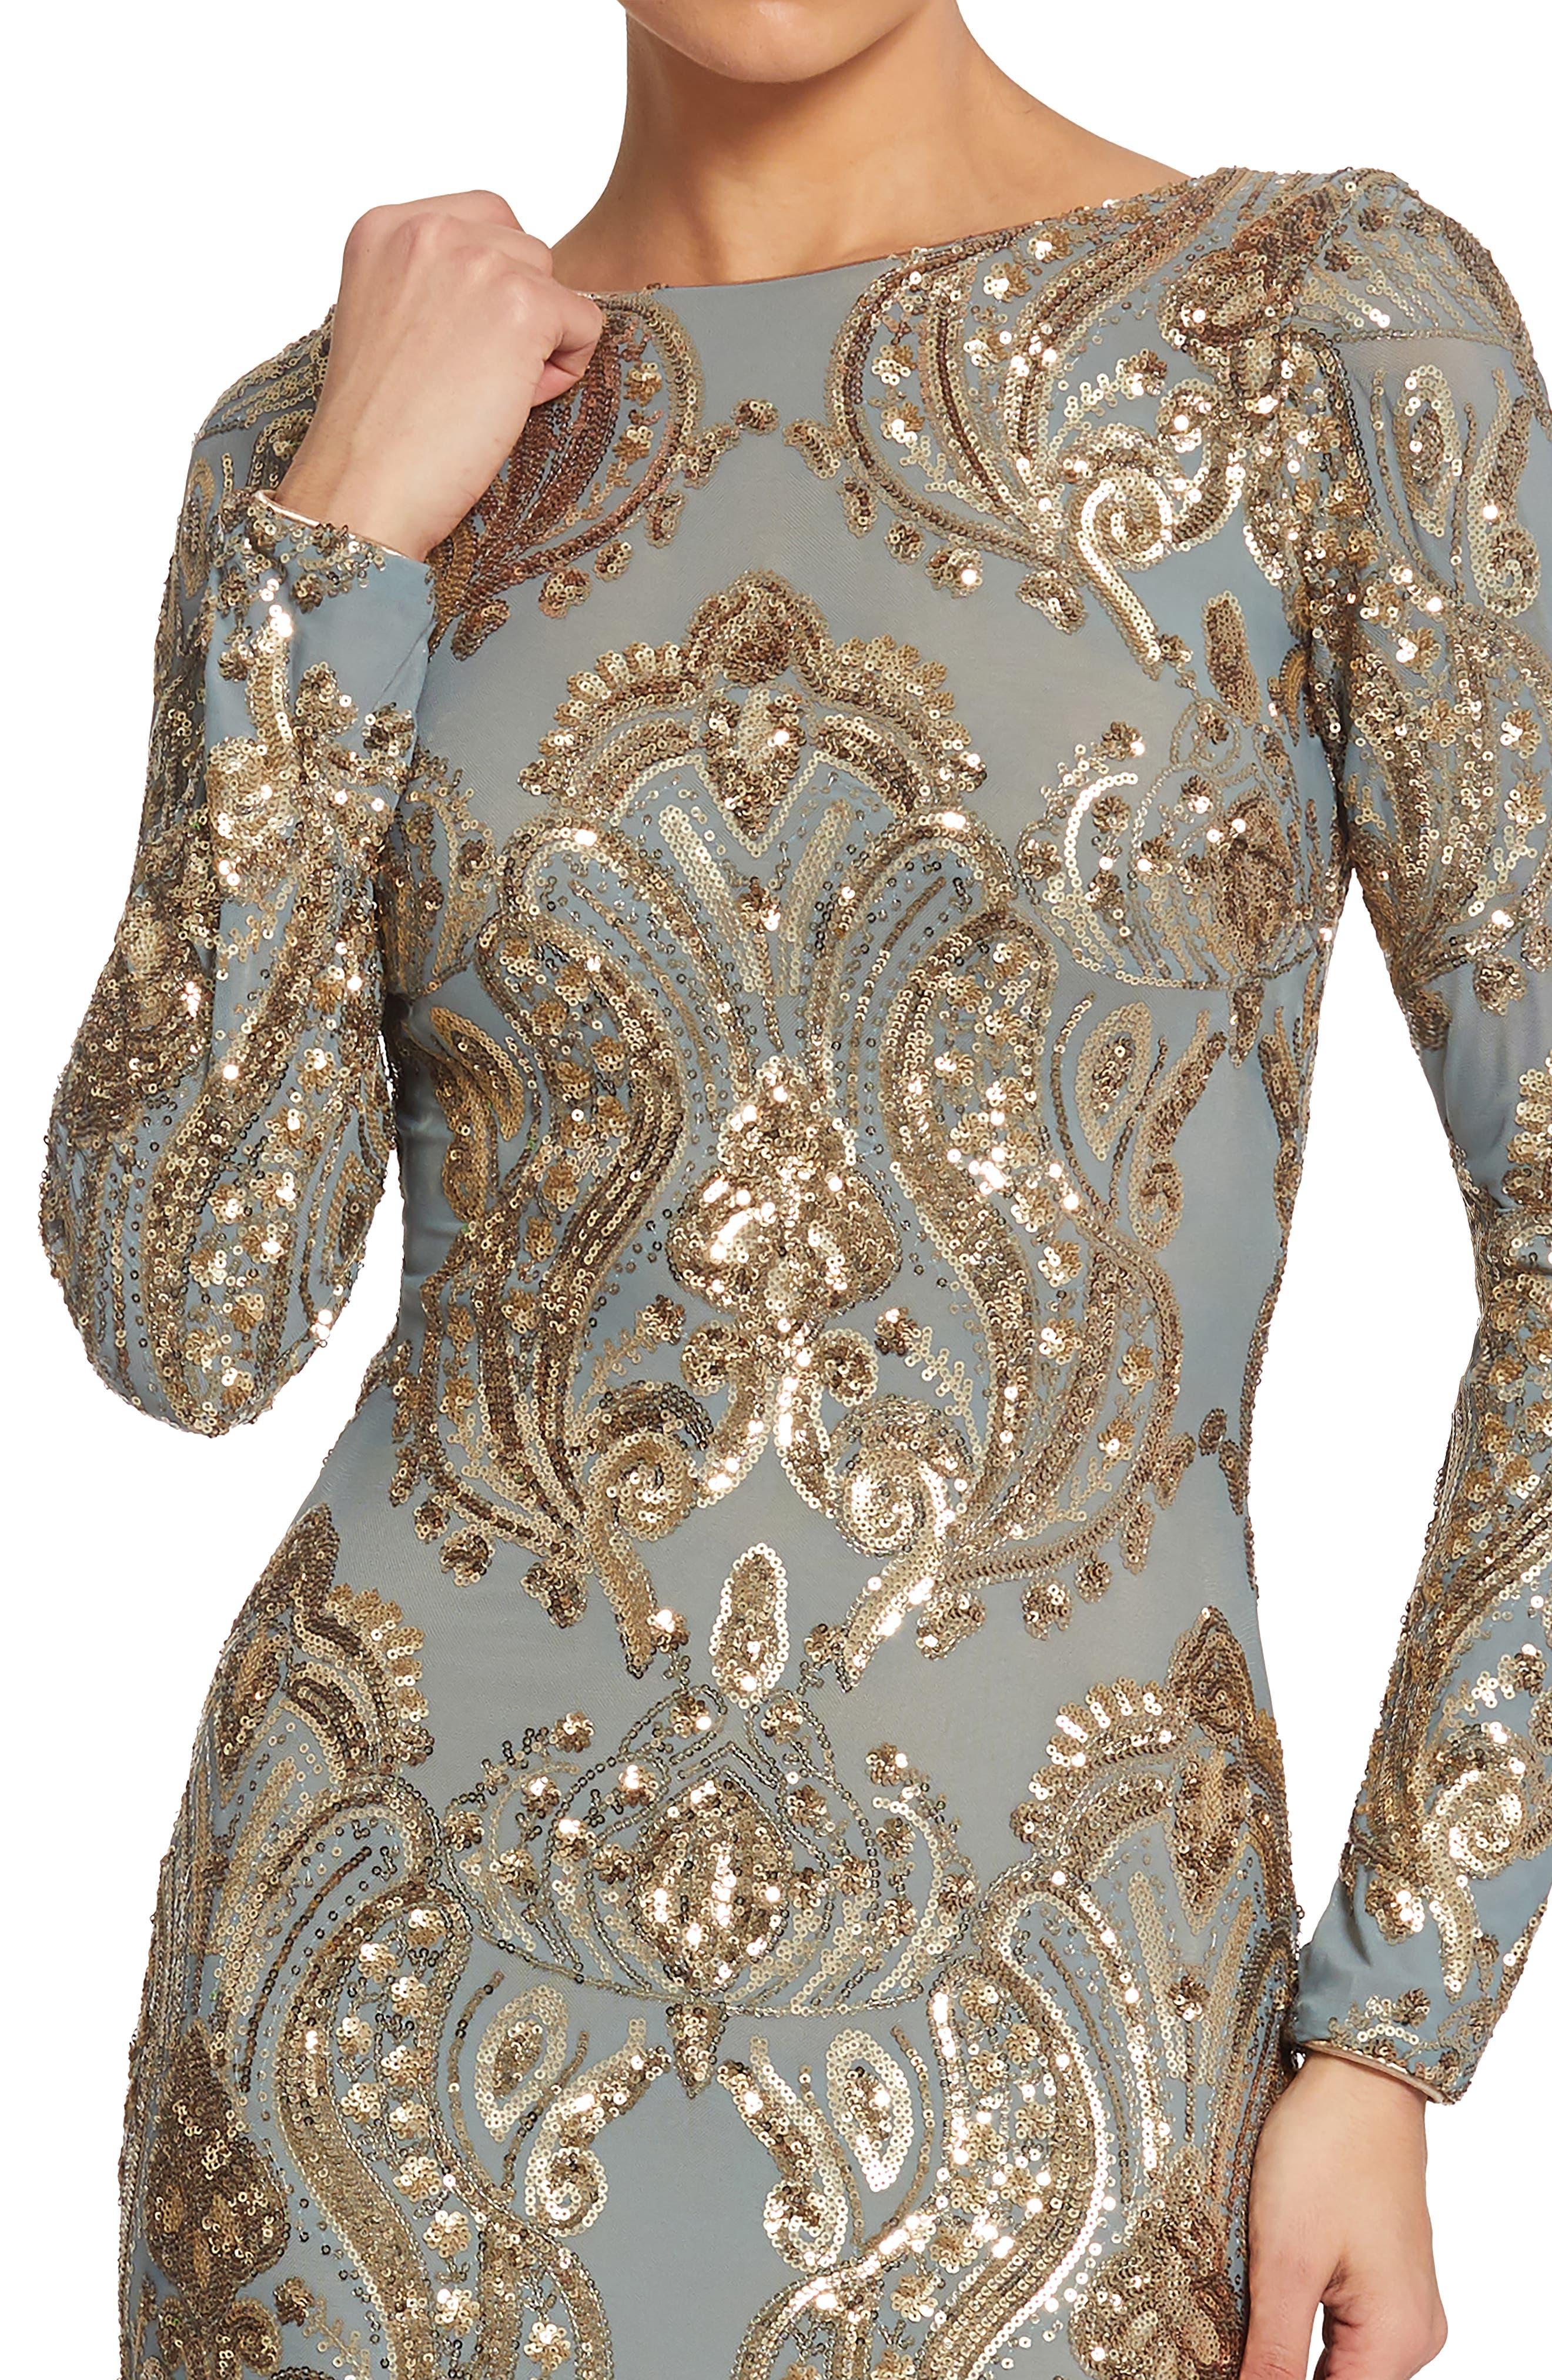 Emery Sequin Sheath Dress,                             Alternate thumbnail 4, color,                             Teal/ Gold